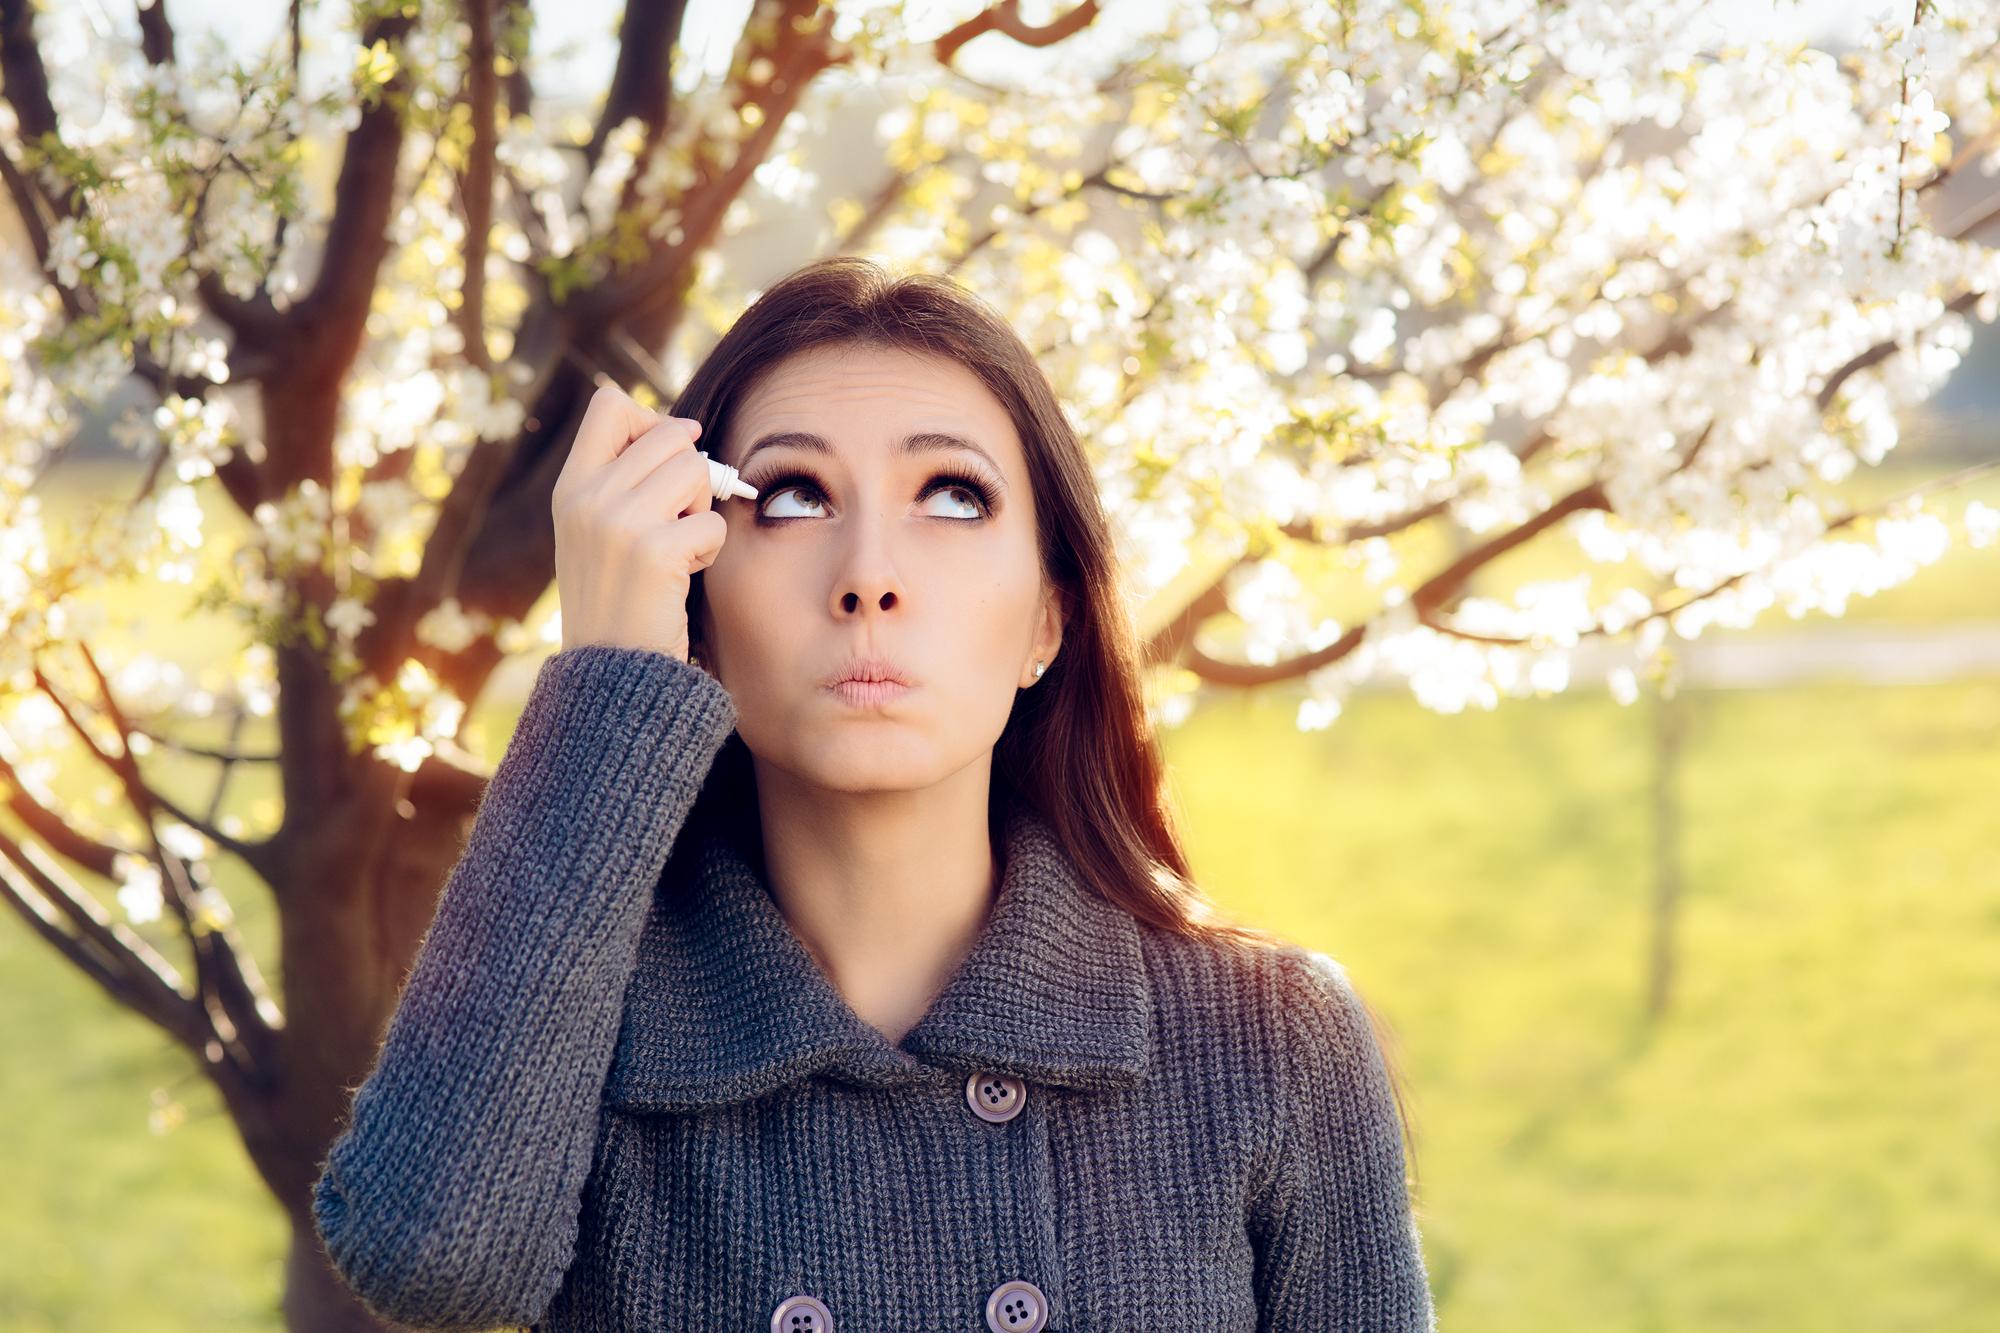 Cuida tus ojos esta primavera